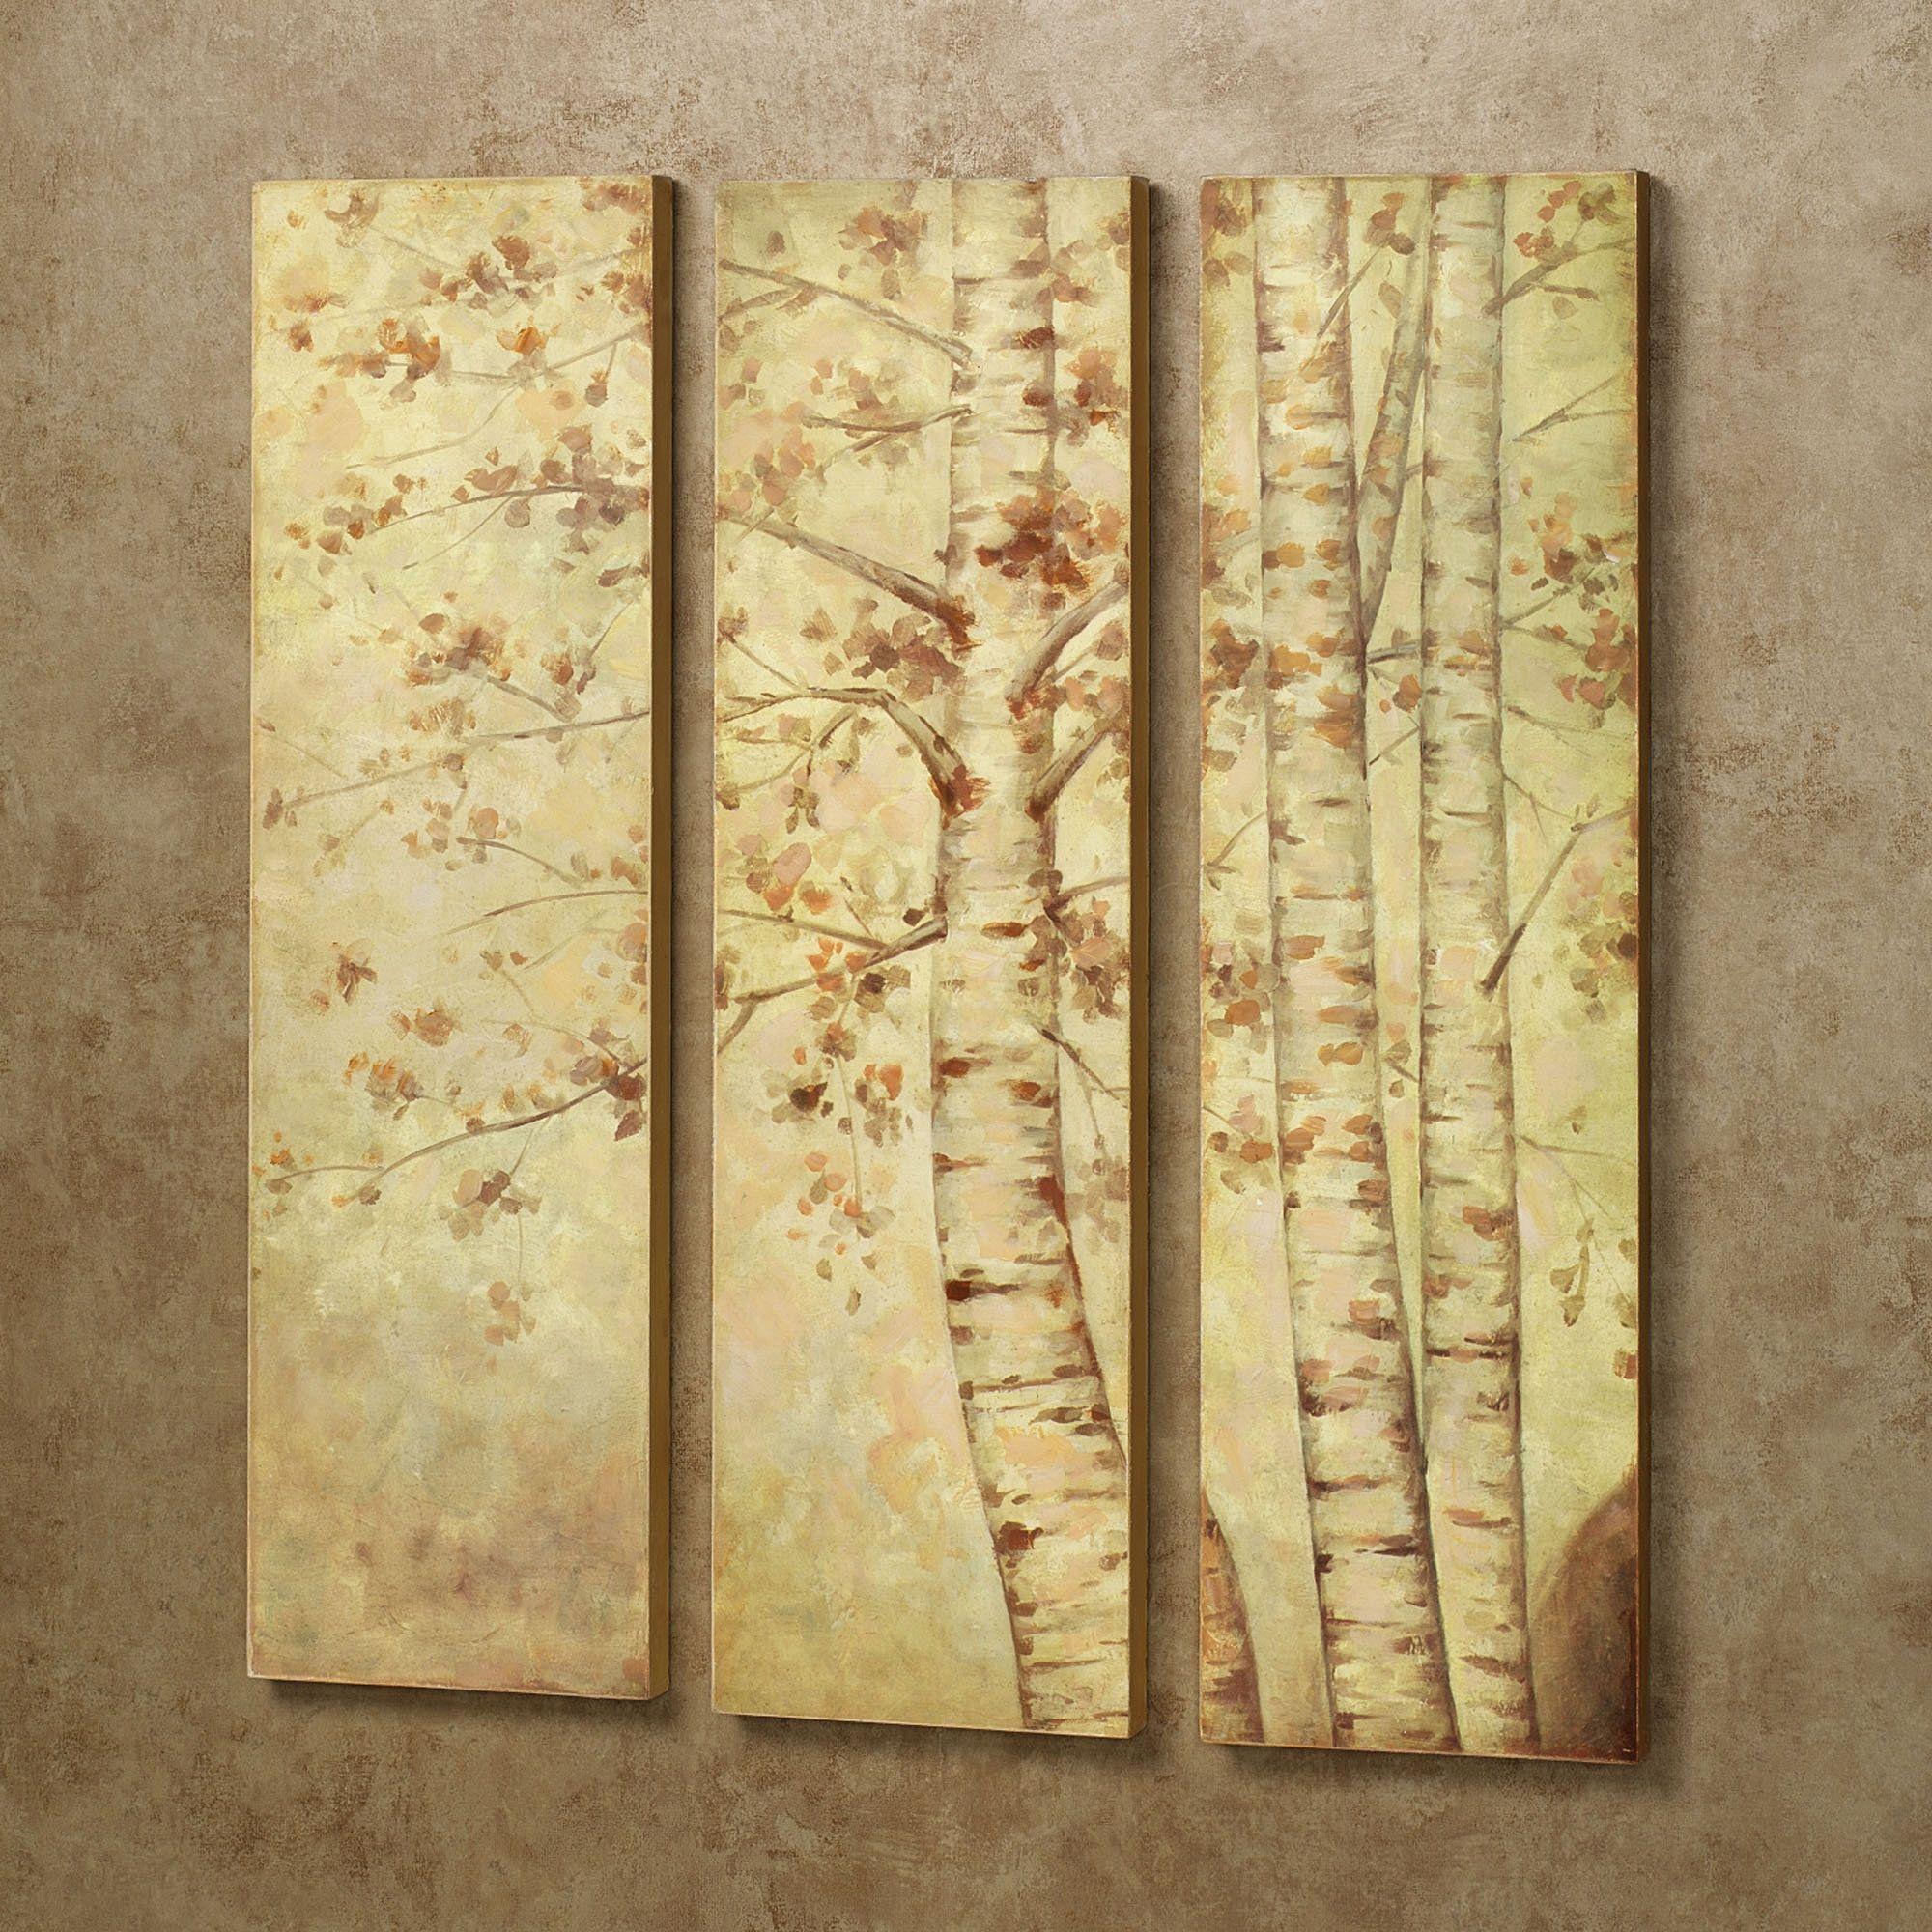 Fall Leaves Wooden Triptych Wall Art Set | Triptych wall art, Wall ...